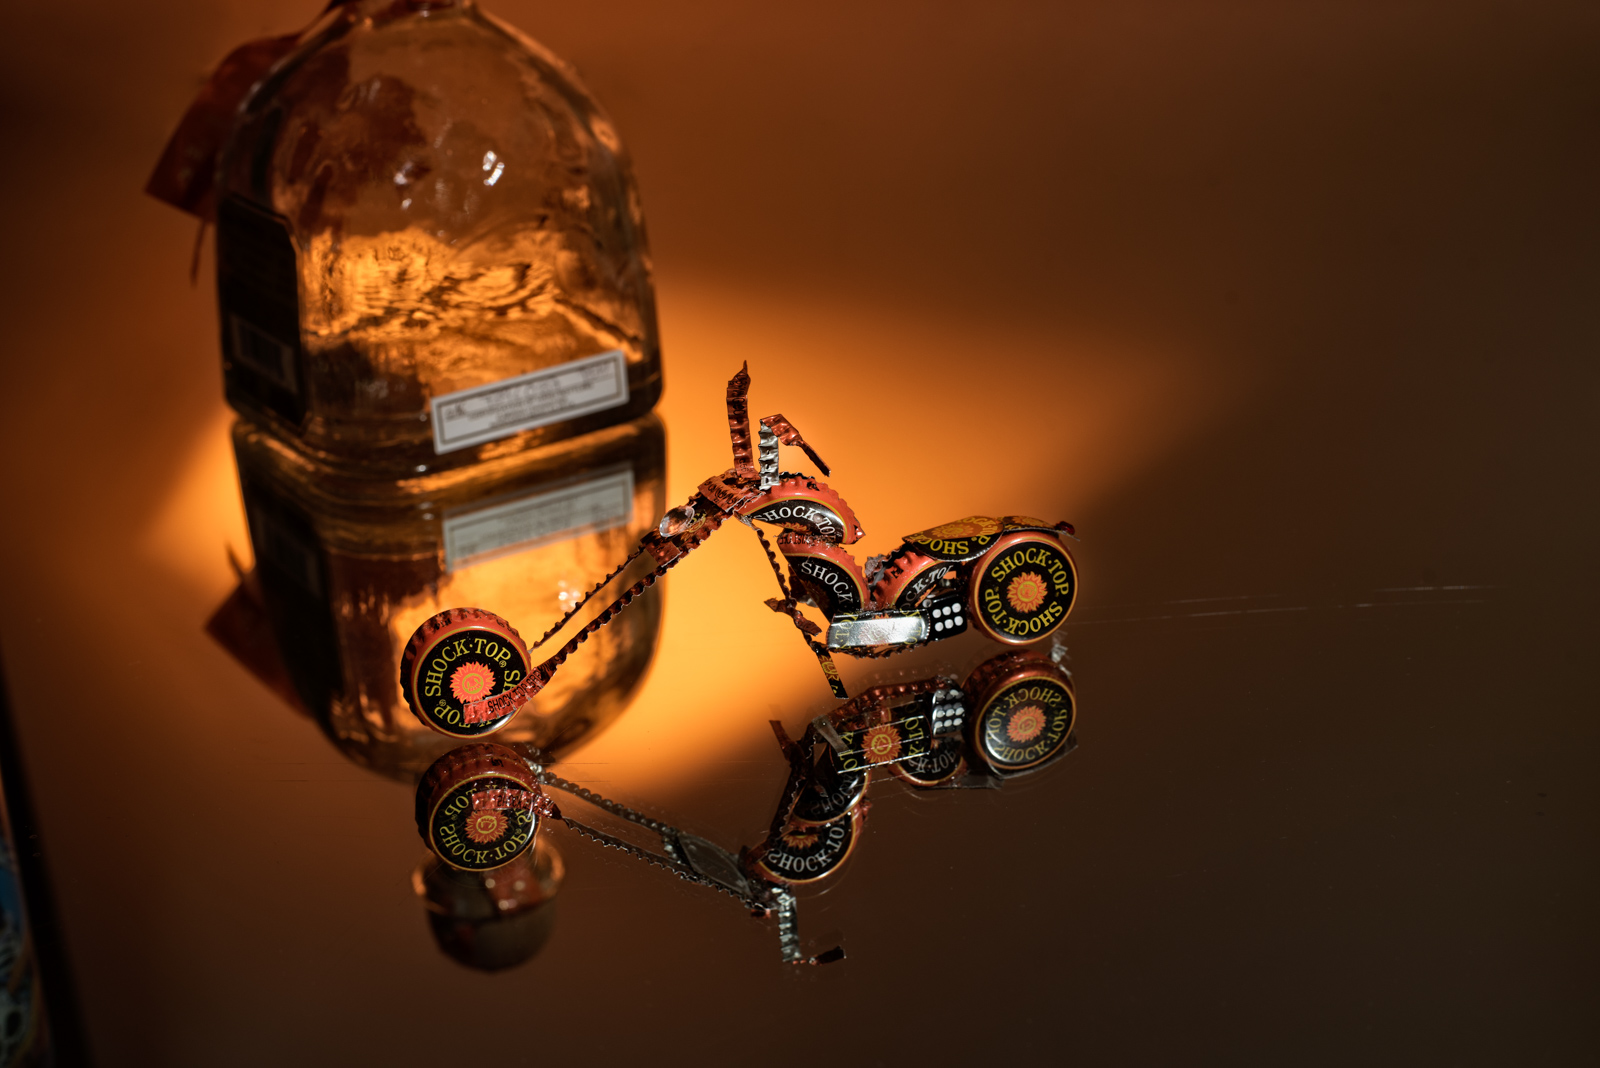 Bottlecap-Pat's-Choppers-Trikes